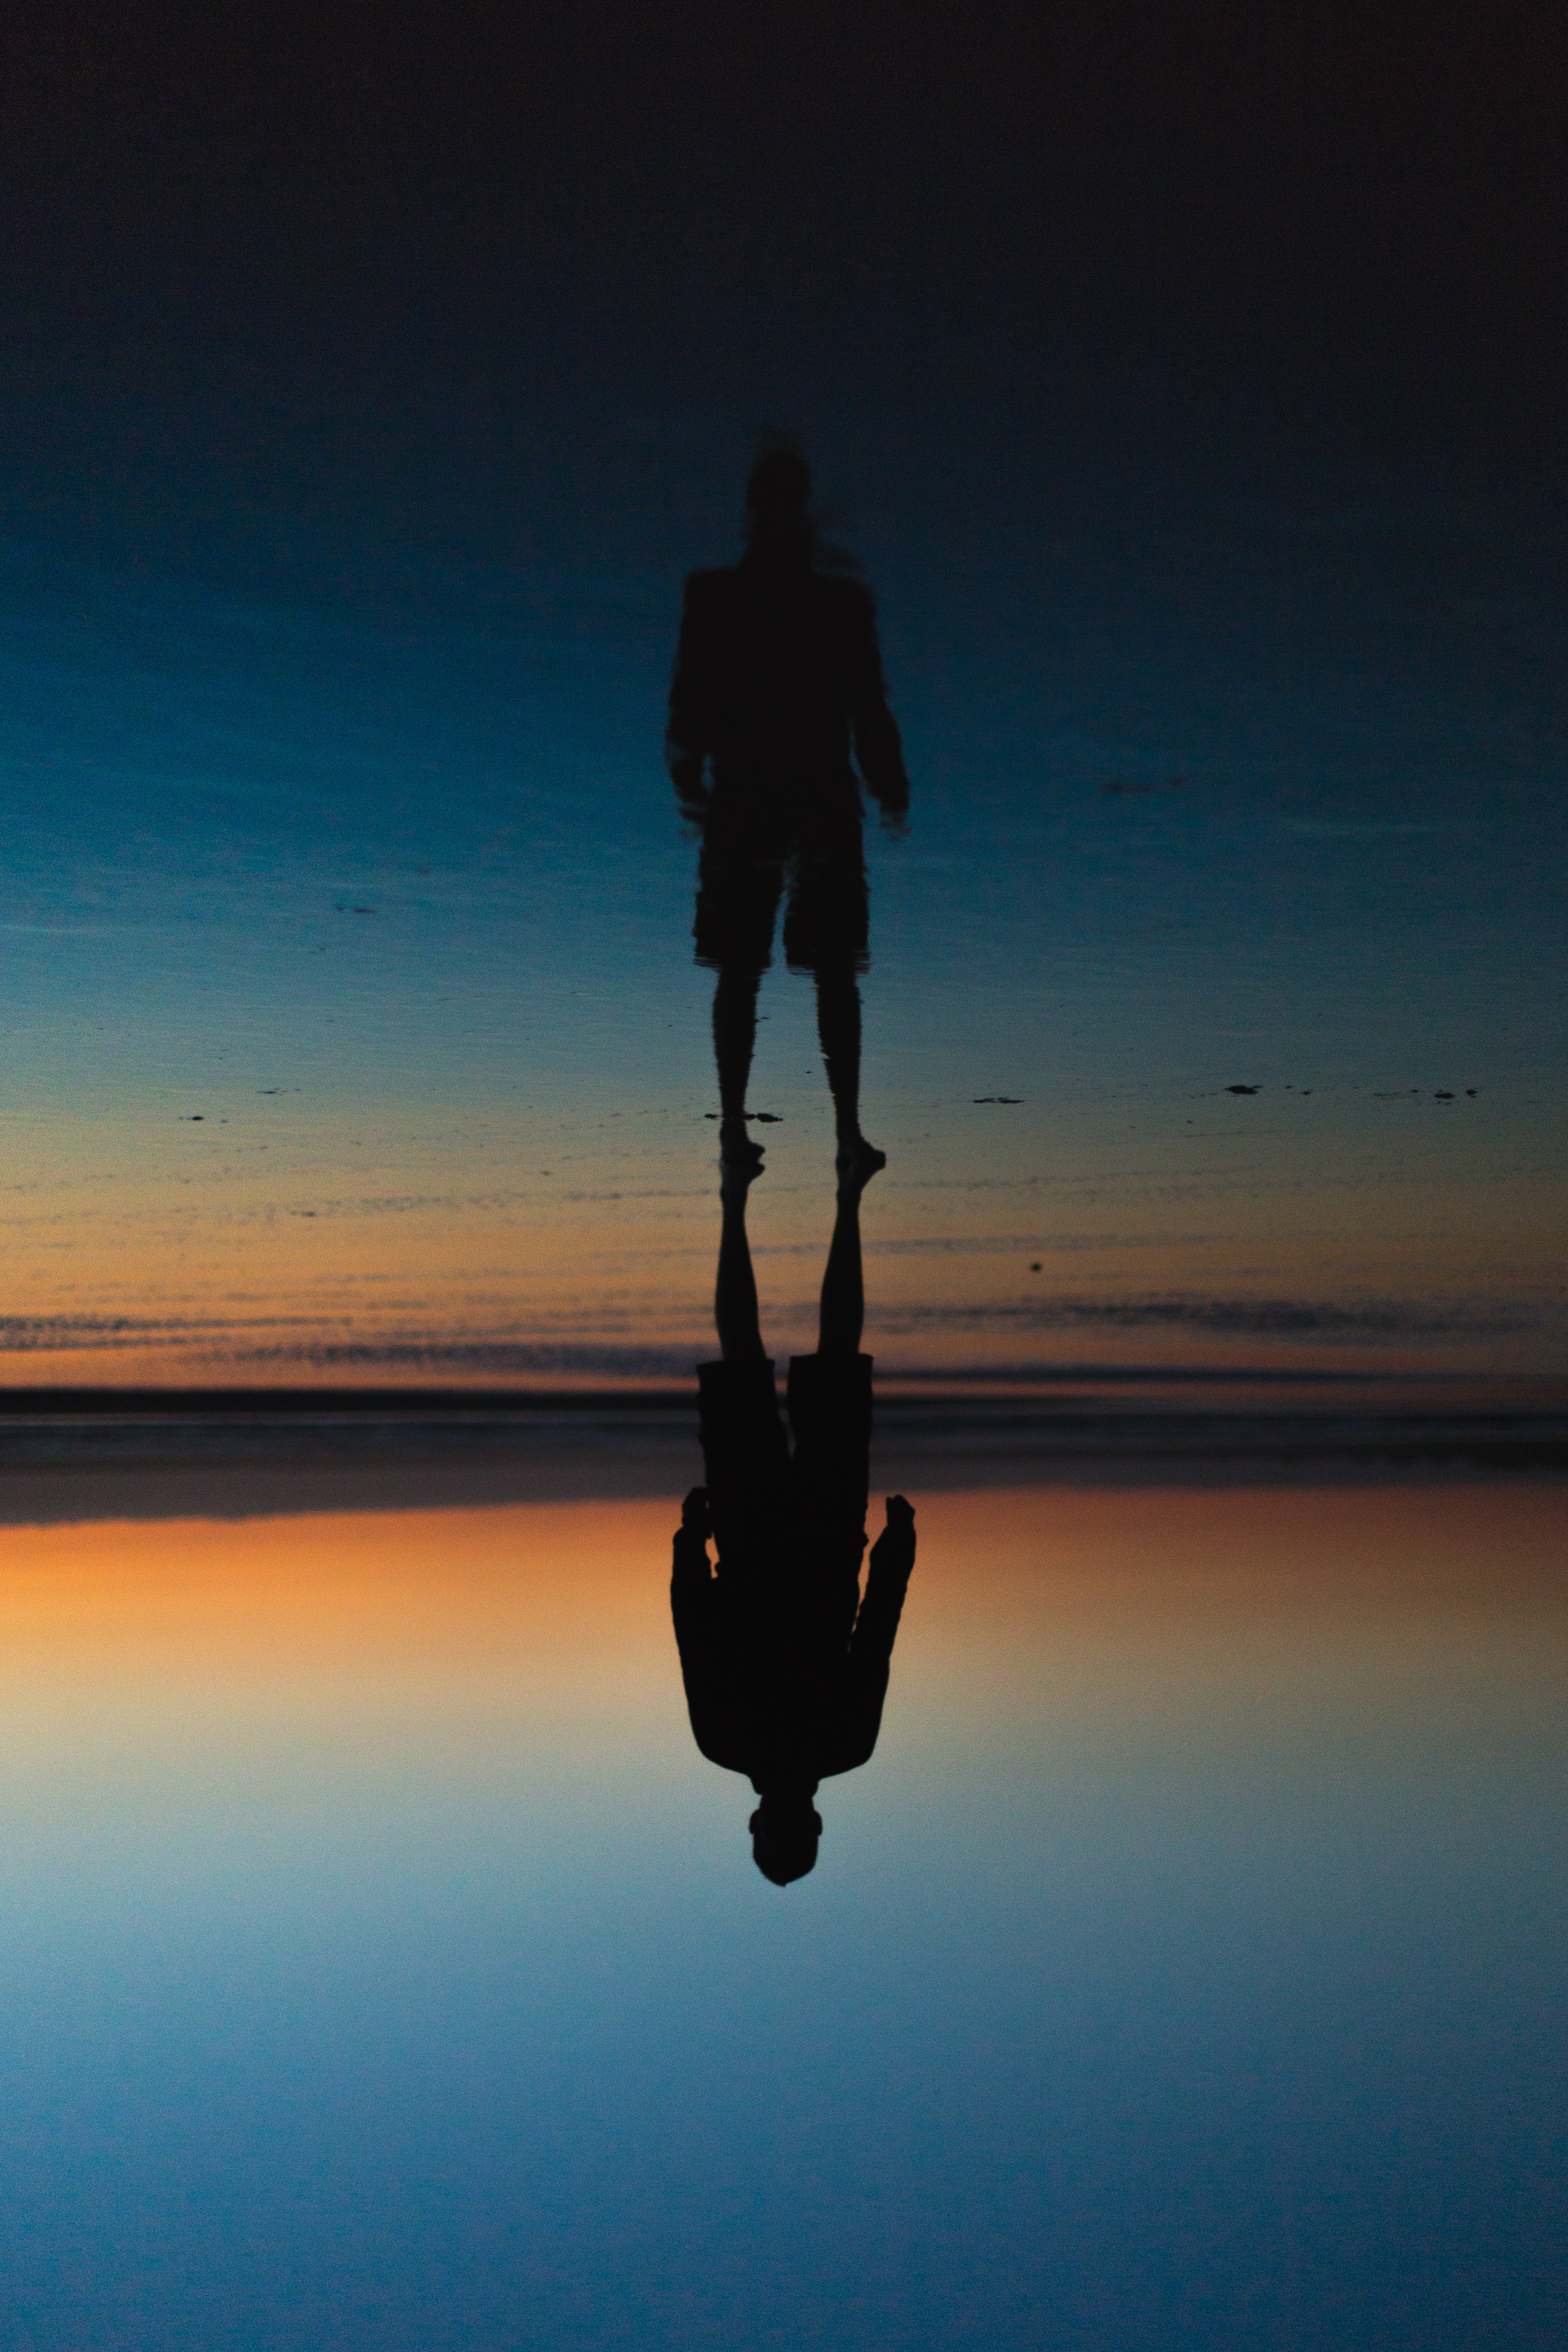 Free stock photos of reflection · Pexels